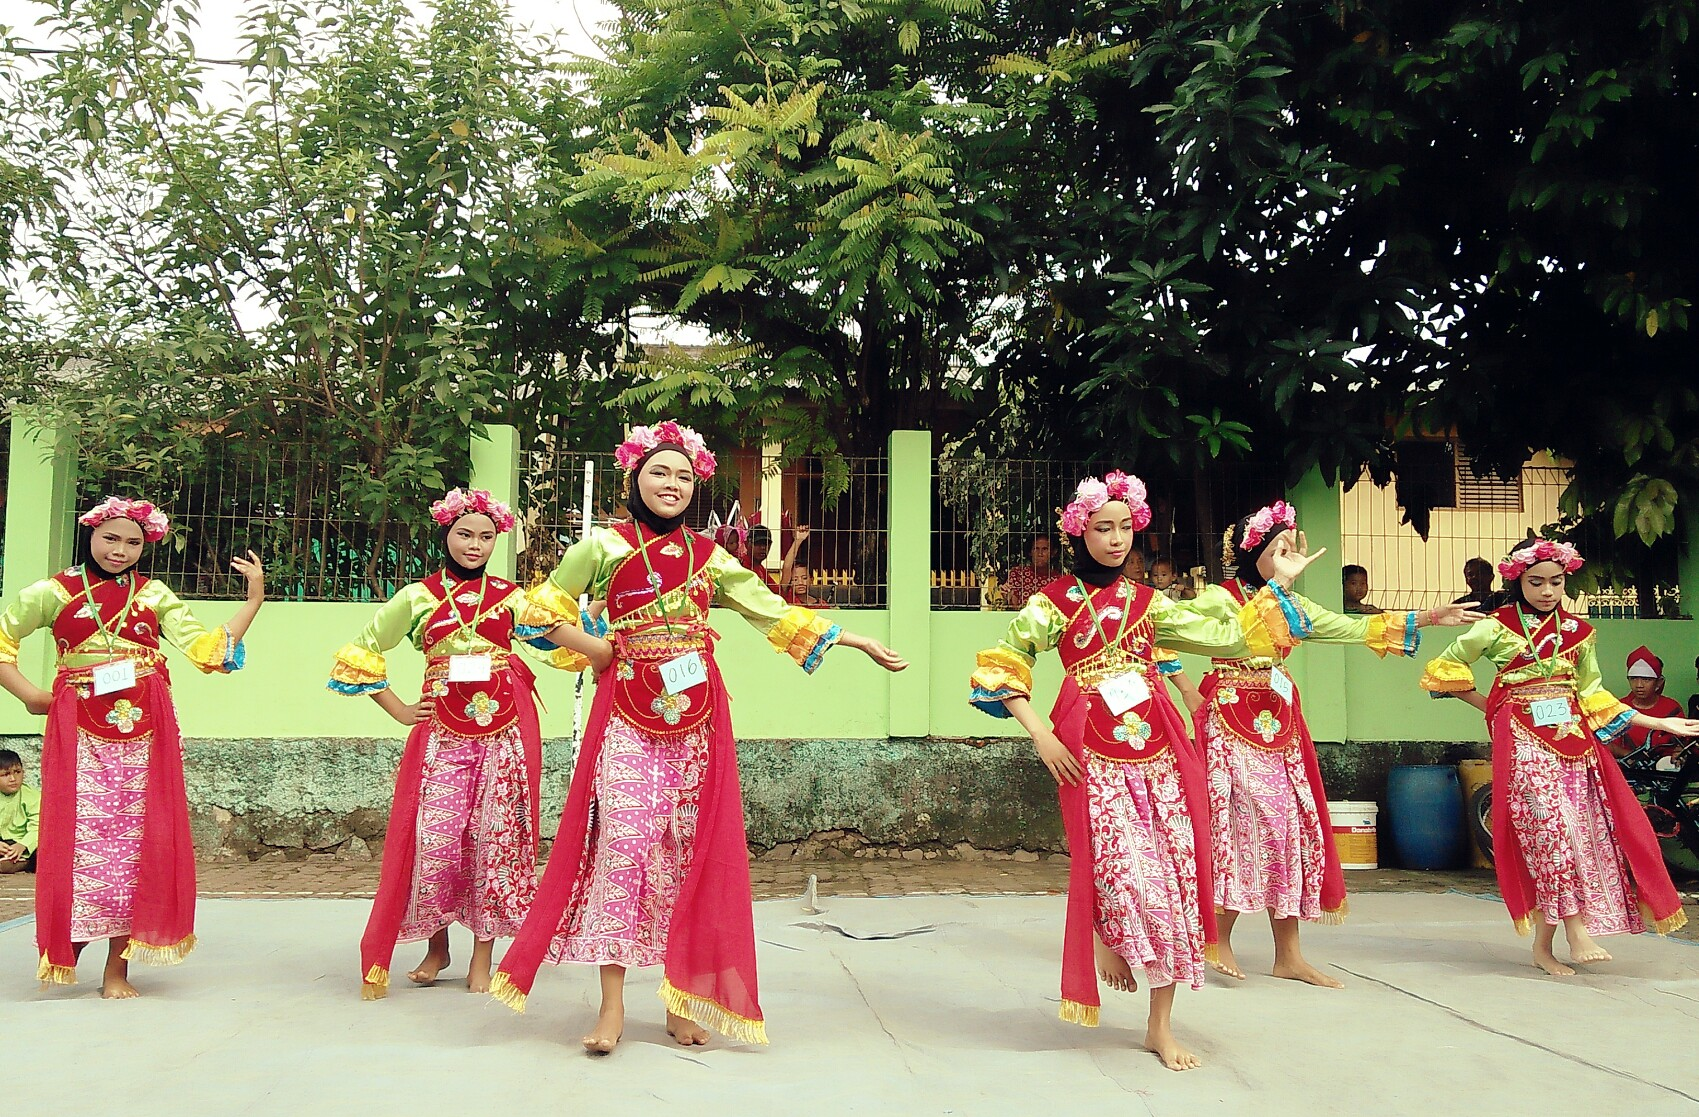 Tarian Jawa barat| Dokumentasi pribadi